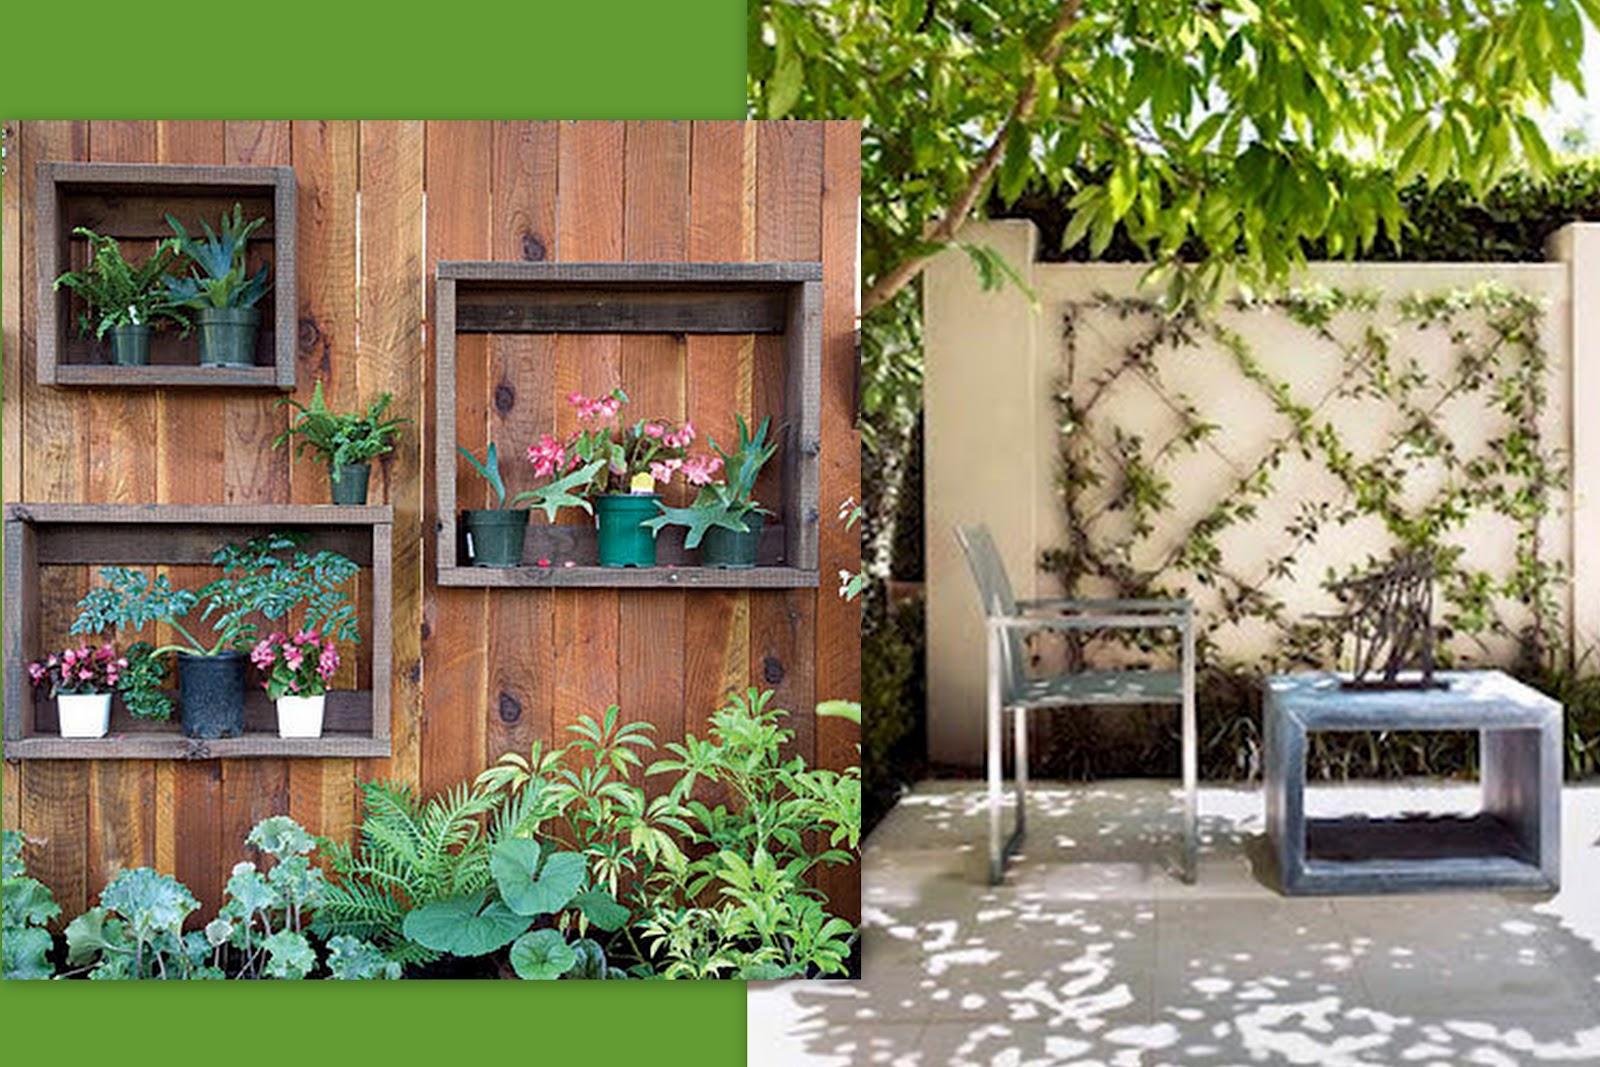 jardim vertical ideias:Jardim Vertical